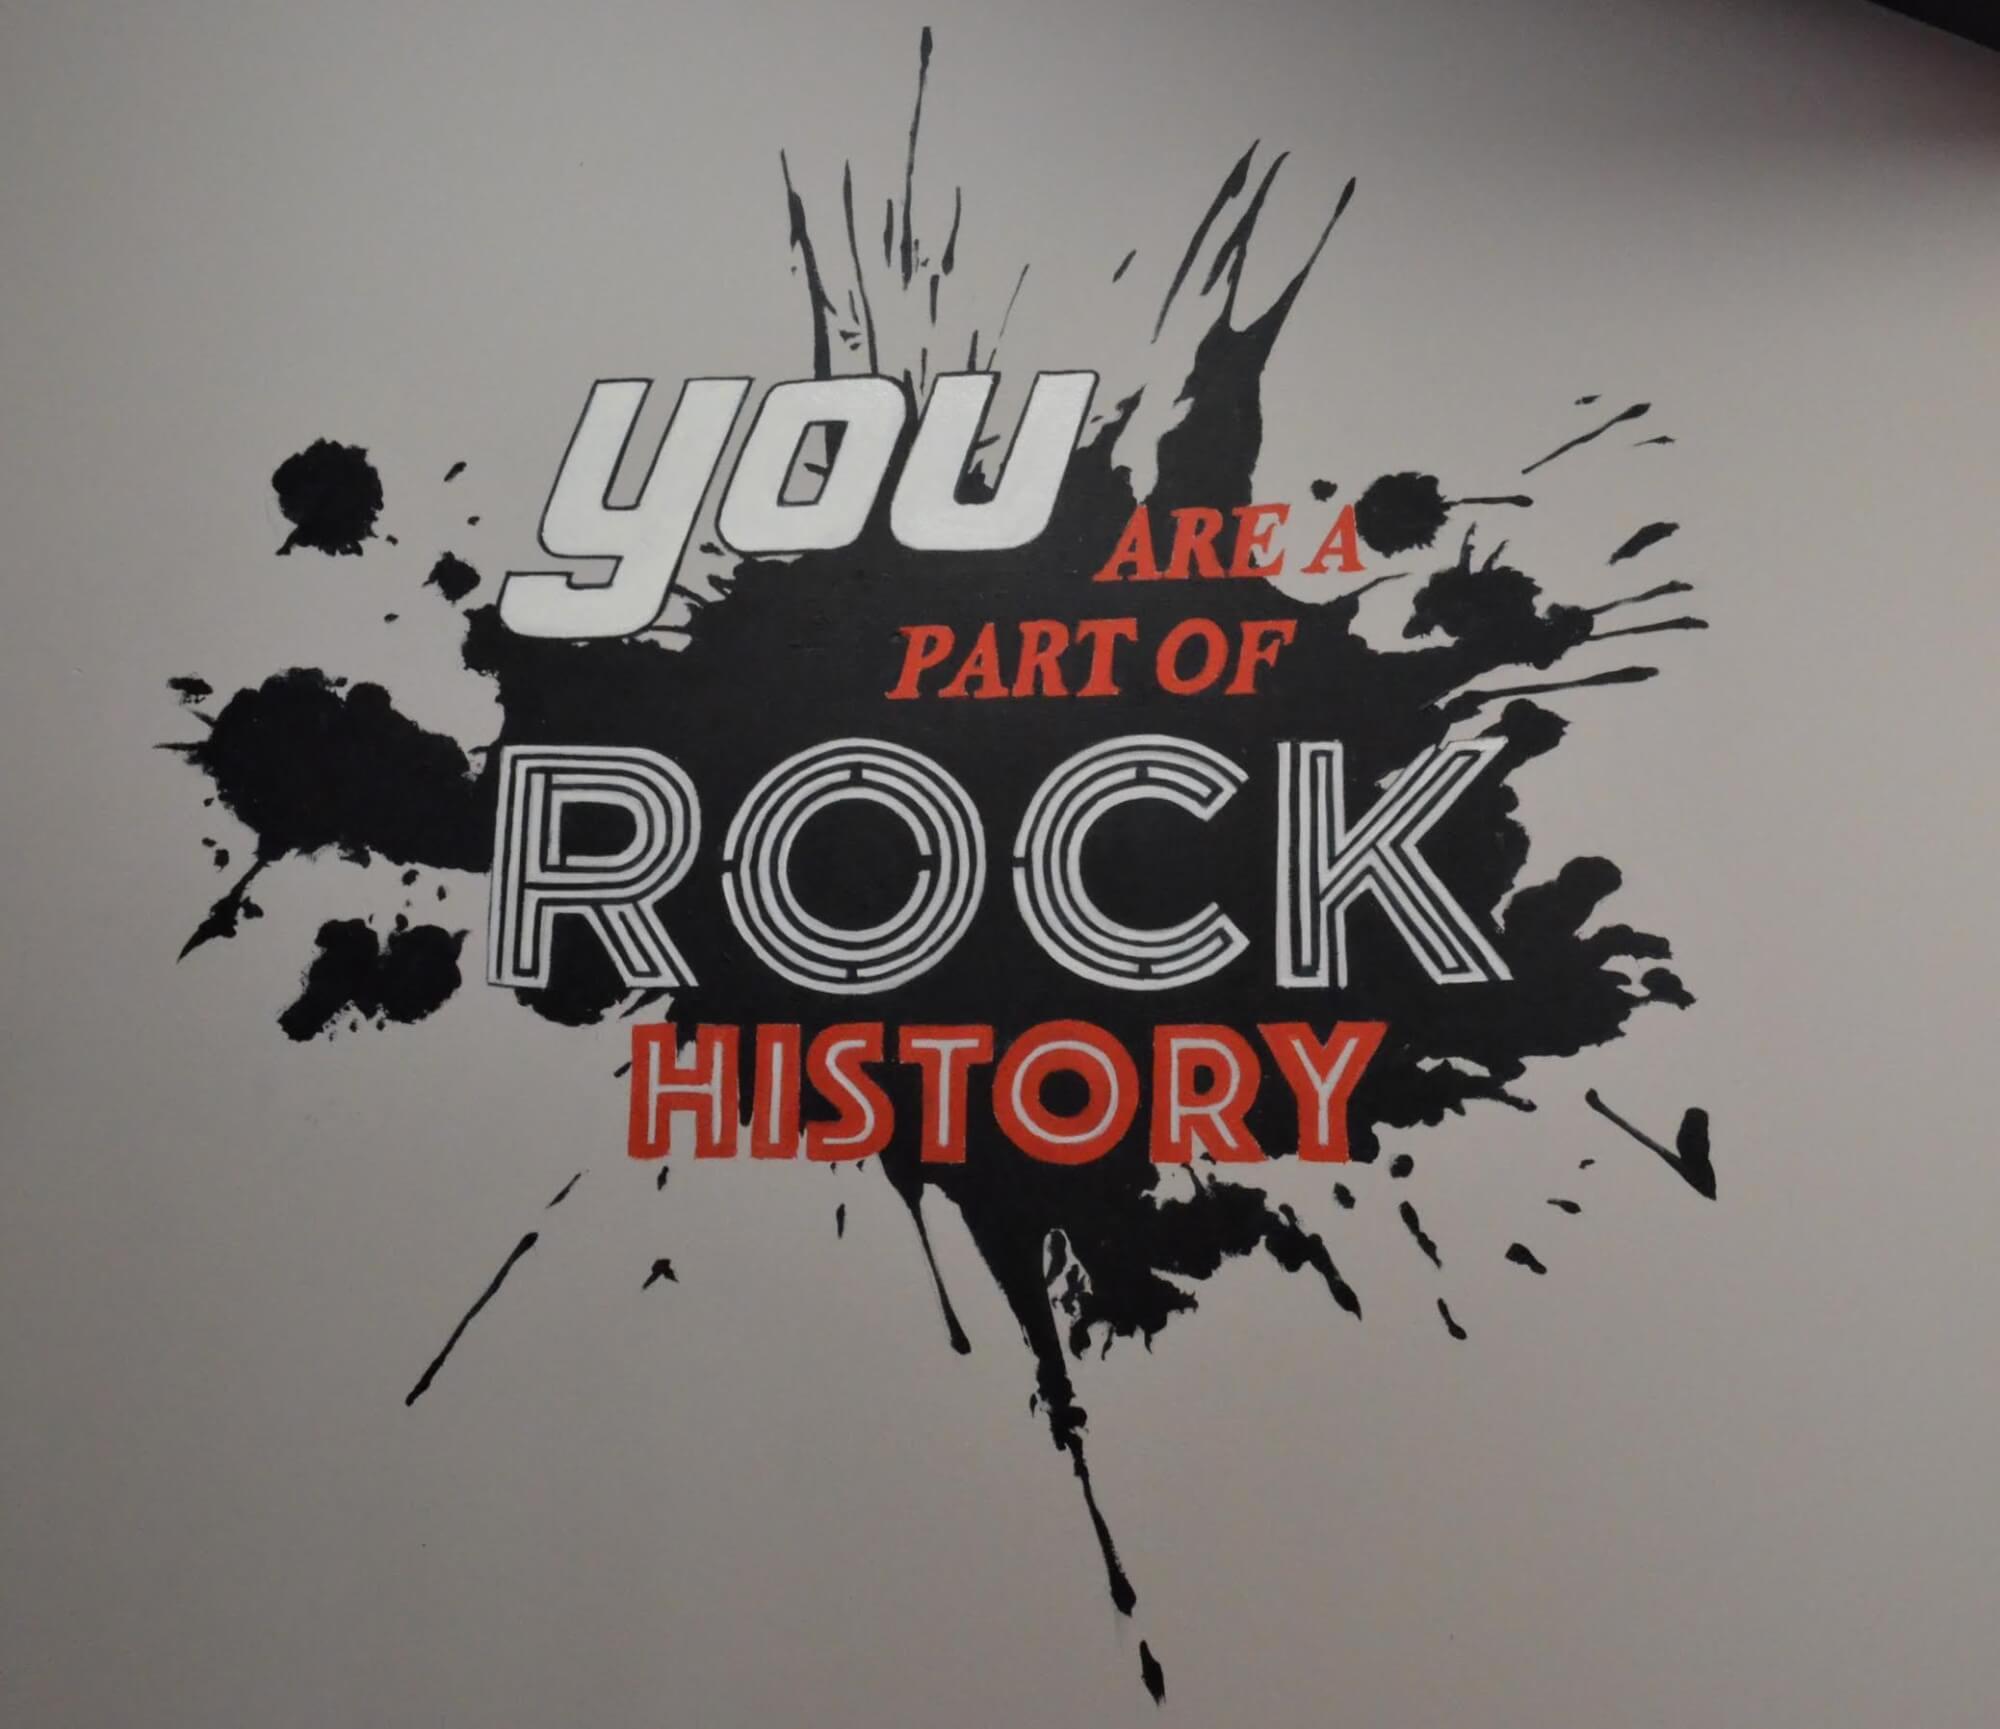 One of our mottos at School of Rock Hoboken.